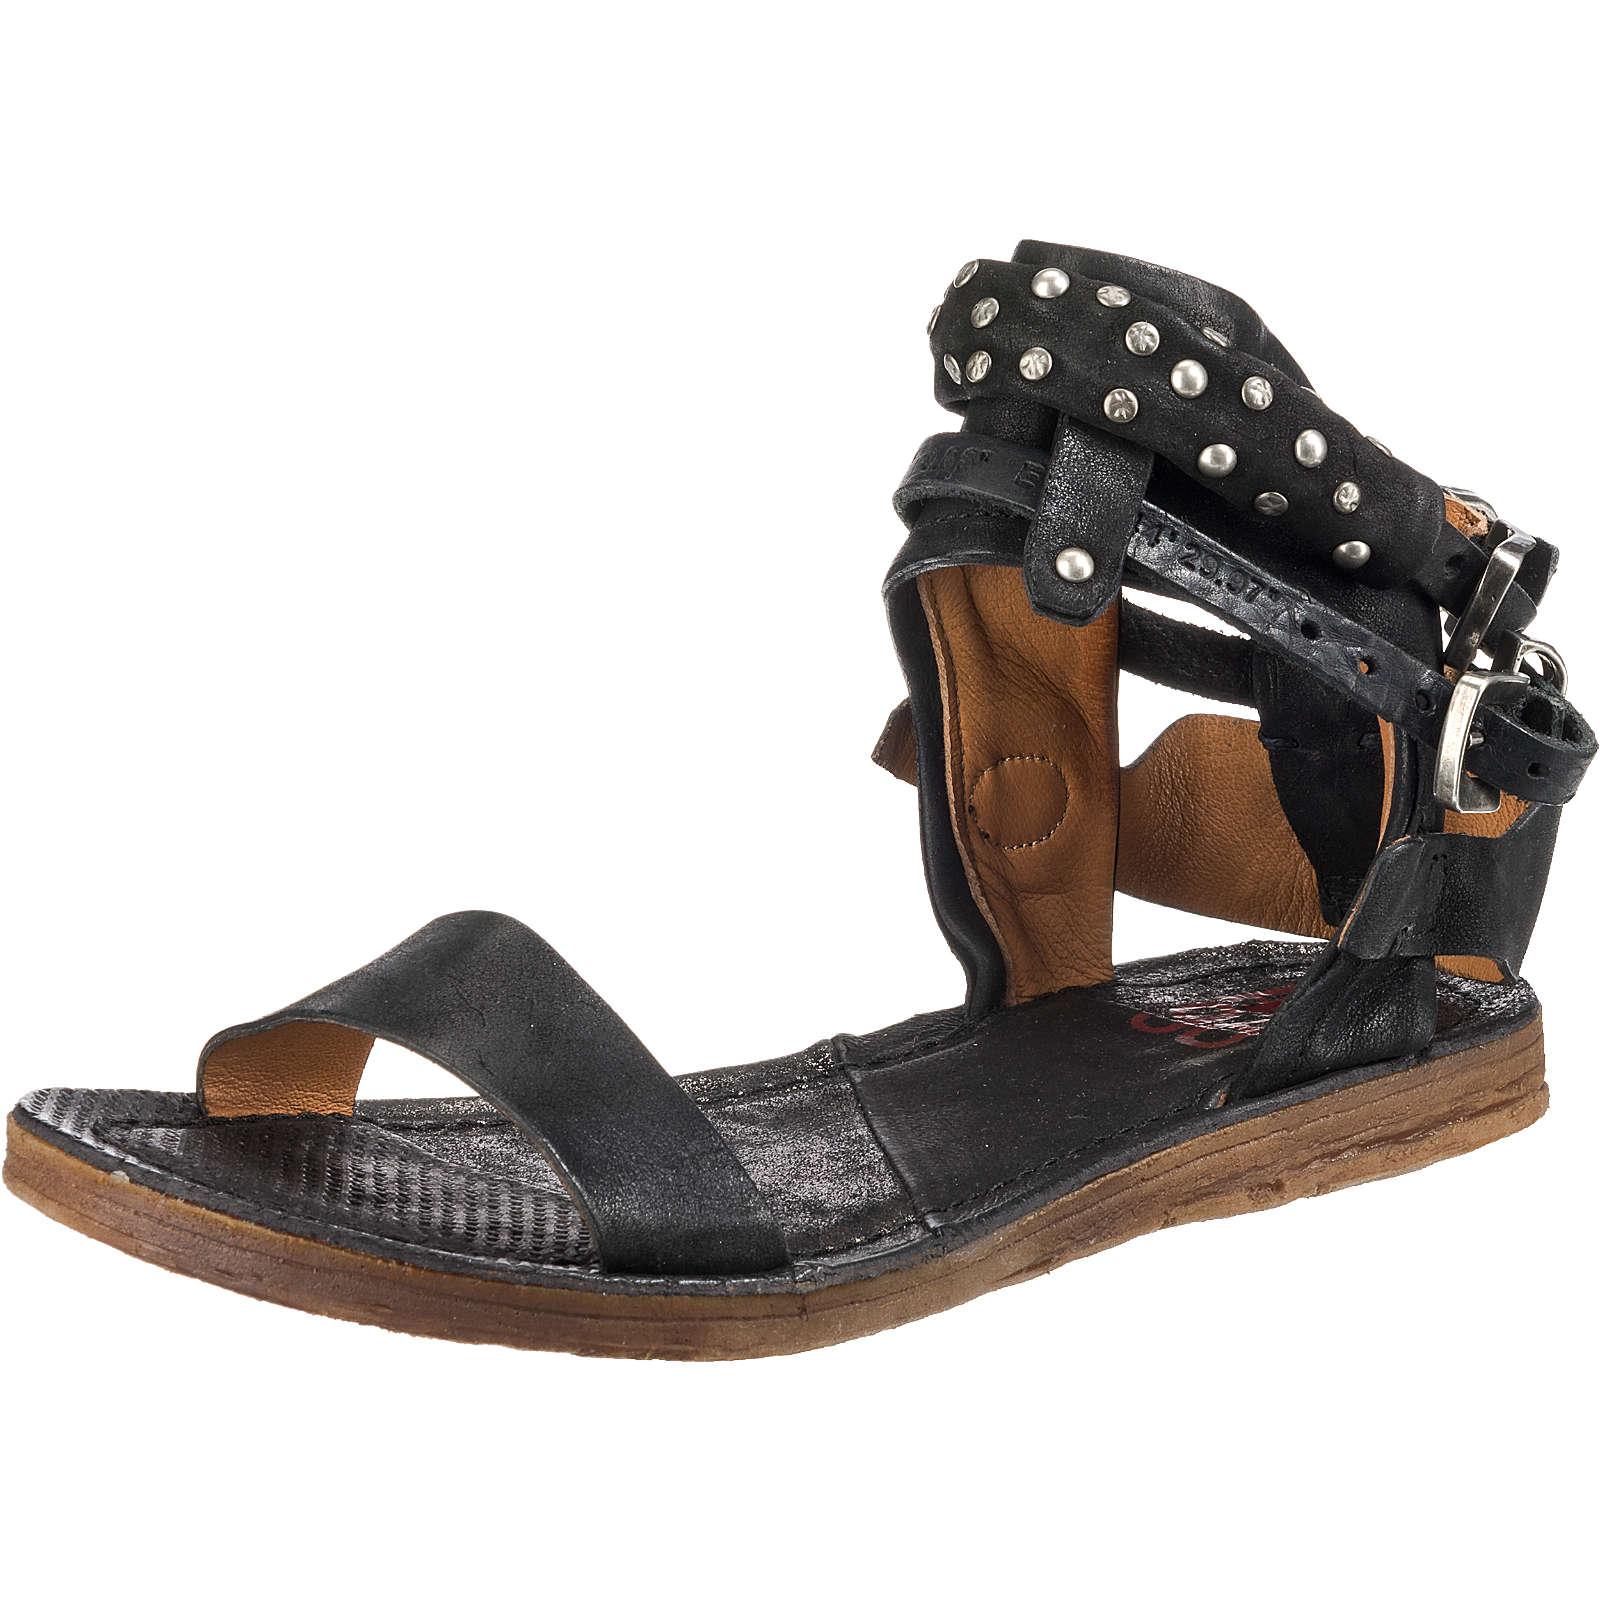 A.S.98 Klassische Sandalen schwarz Damen Gr. 40